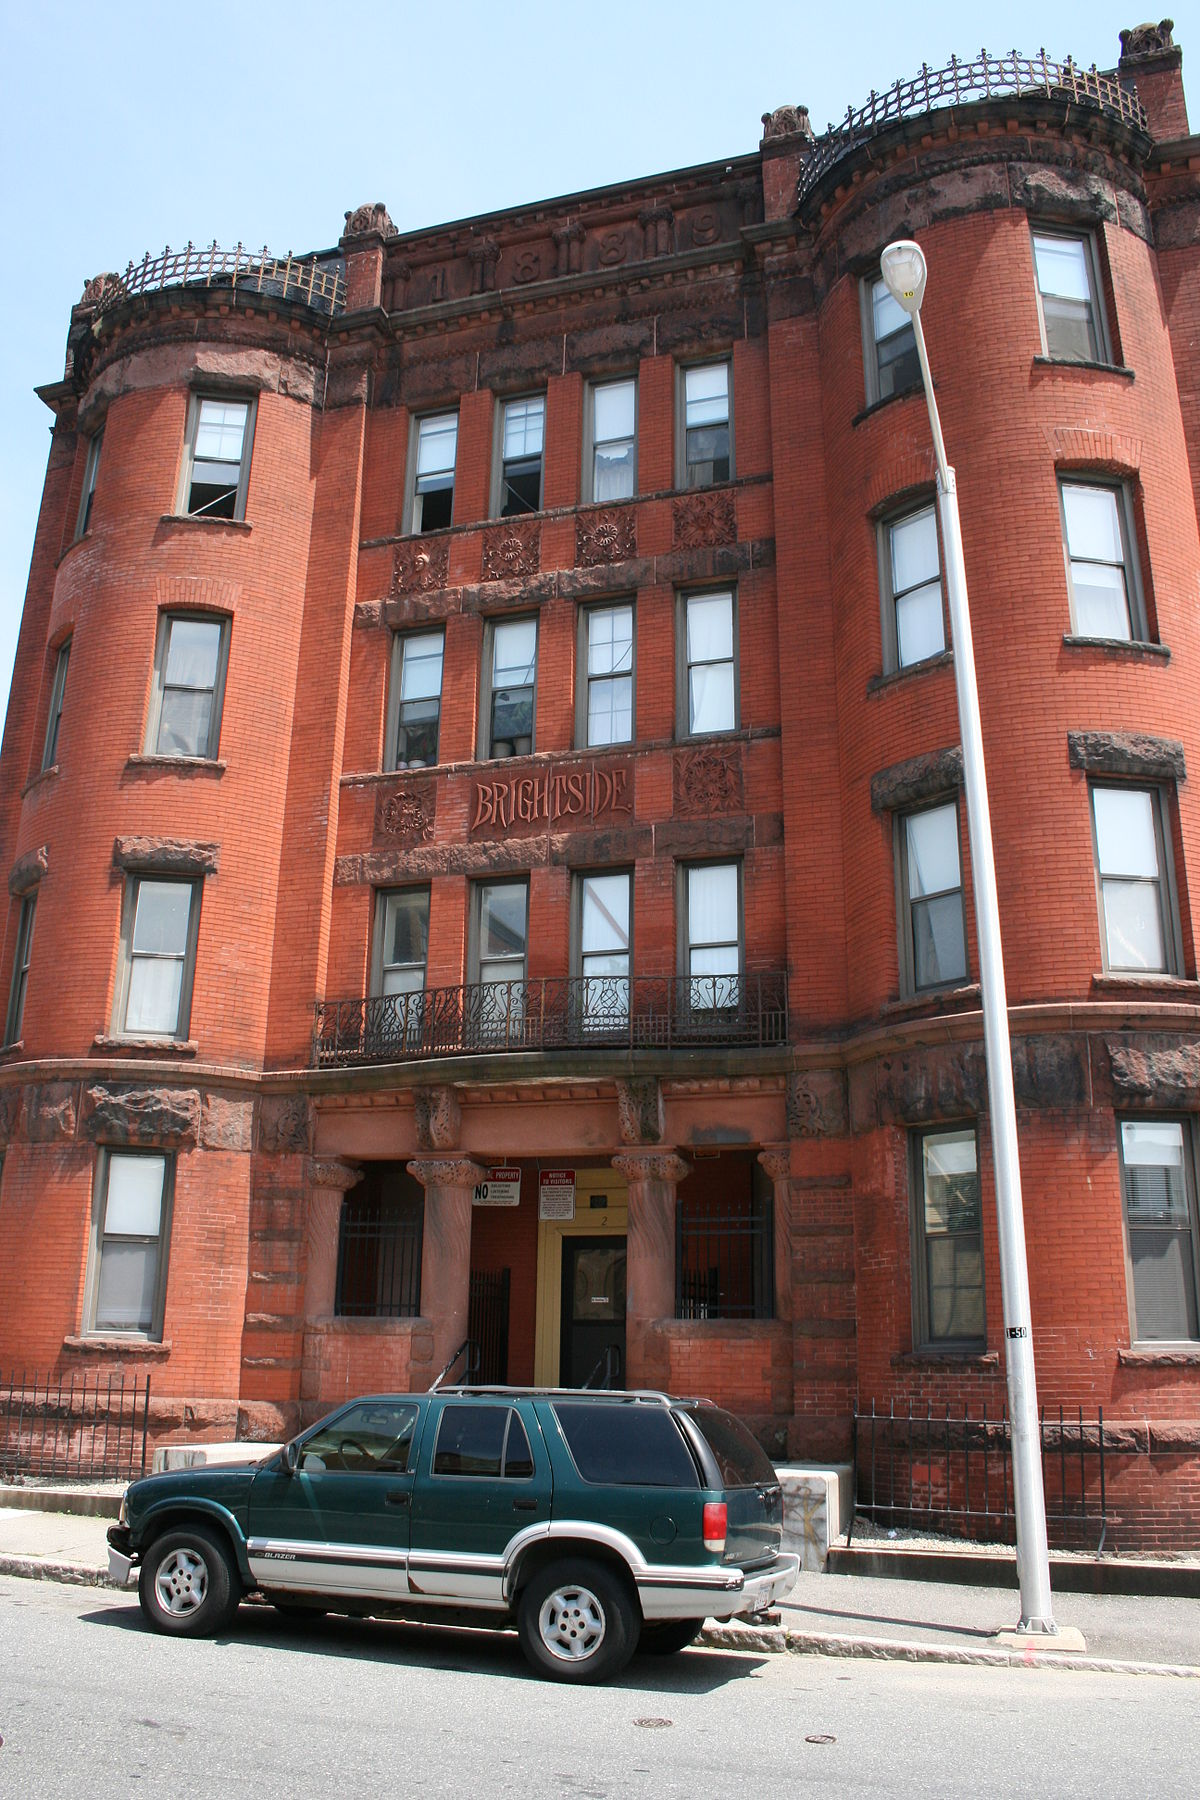 Brightside Apartments  Wikipedia